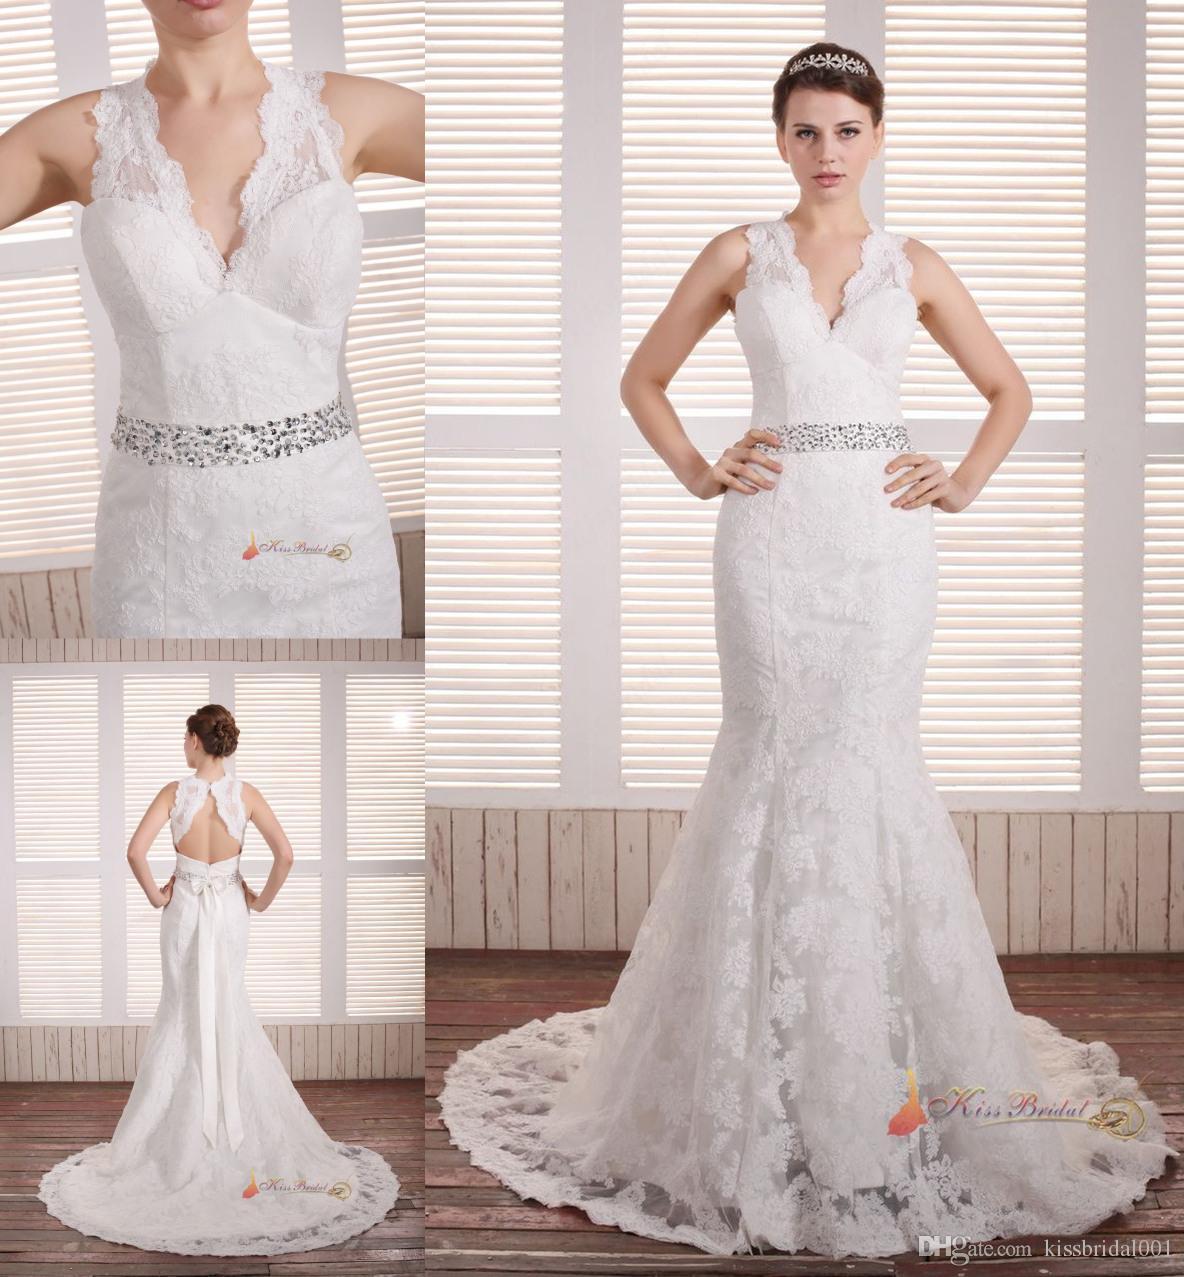 Elegant 2015 Designer Wedding Dresses With Beaded Sash